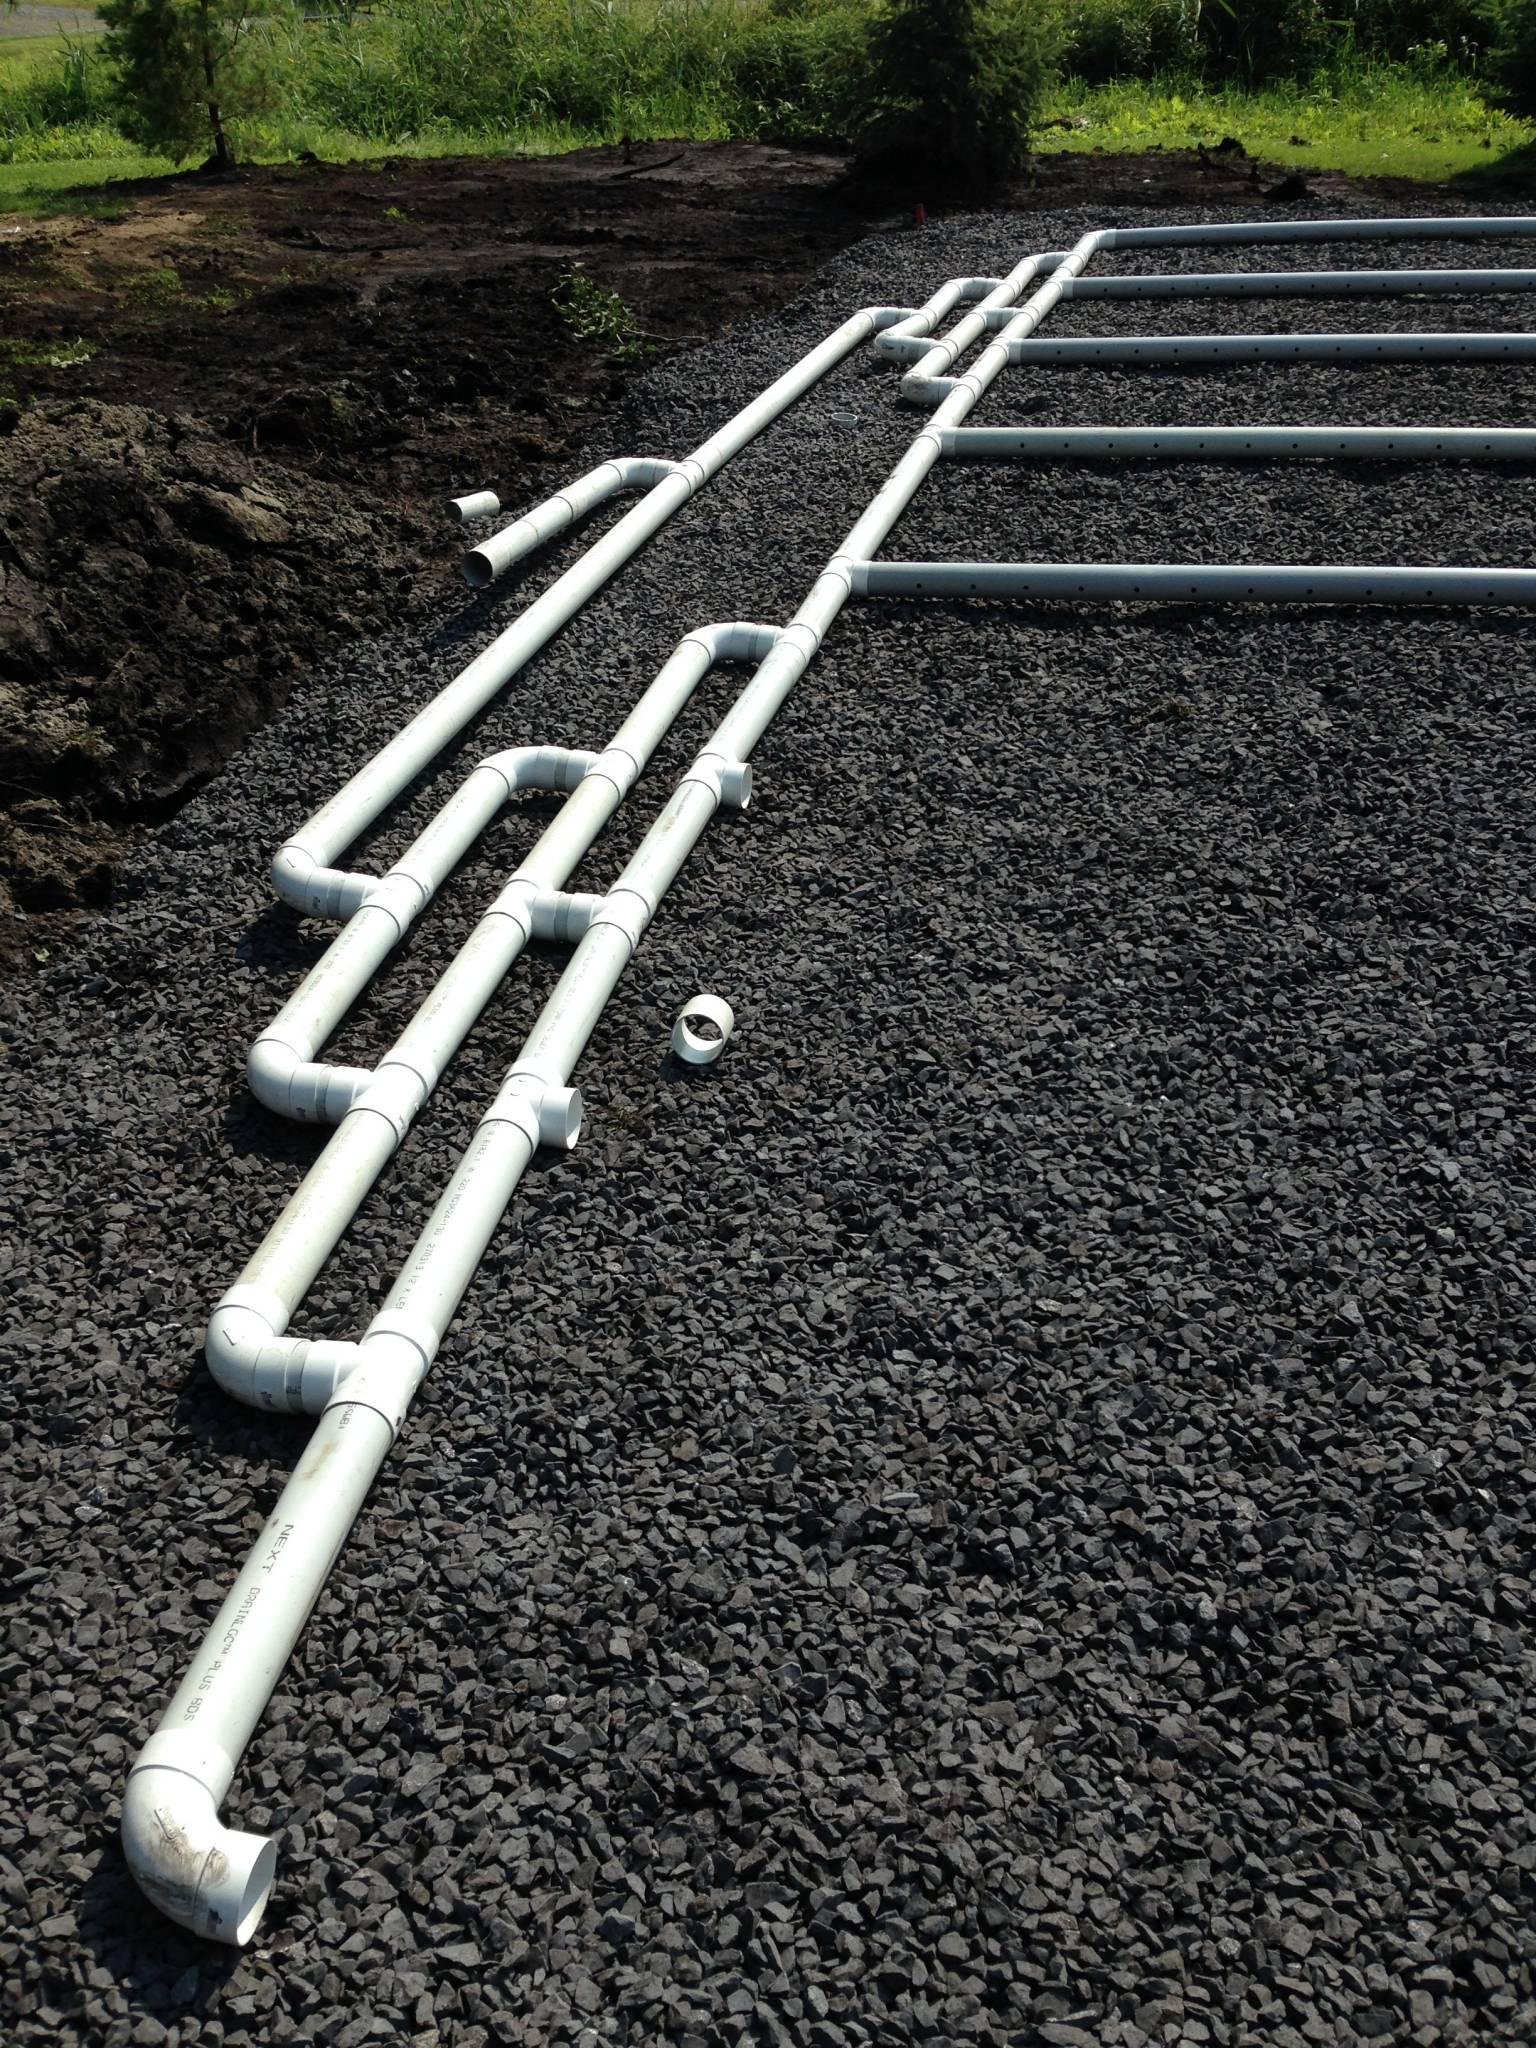 Envrio Transpex - Installations septiques et drain